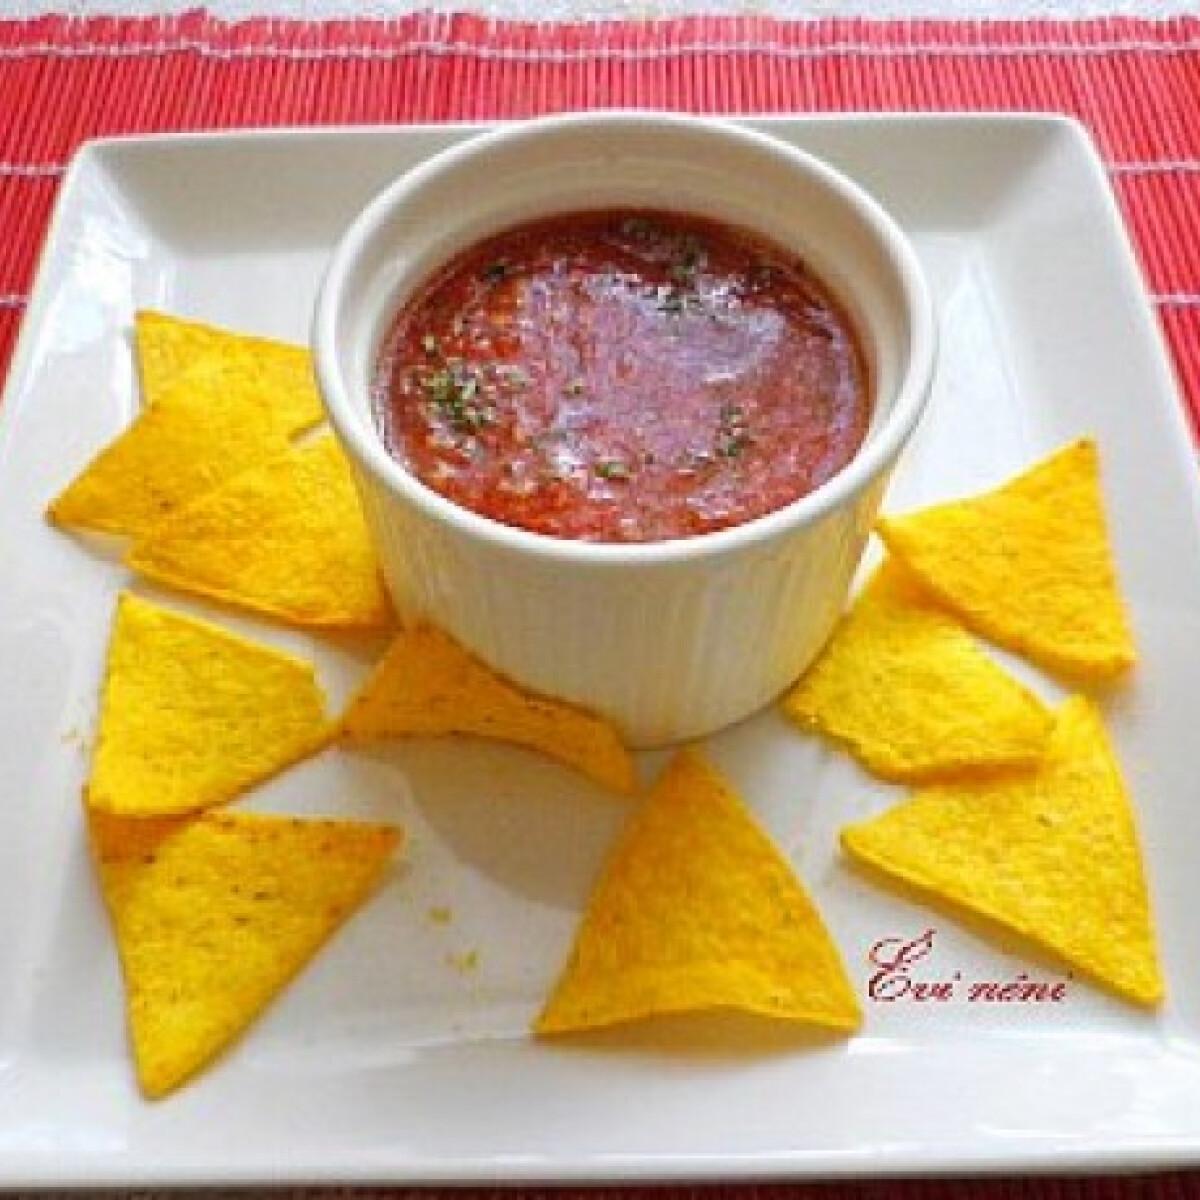 Ezen a képen: Chilis salsa